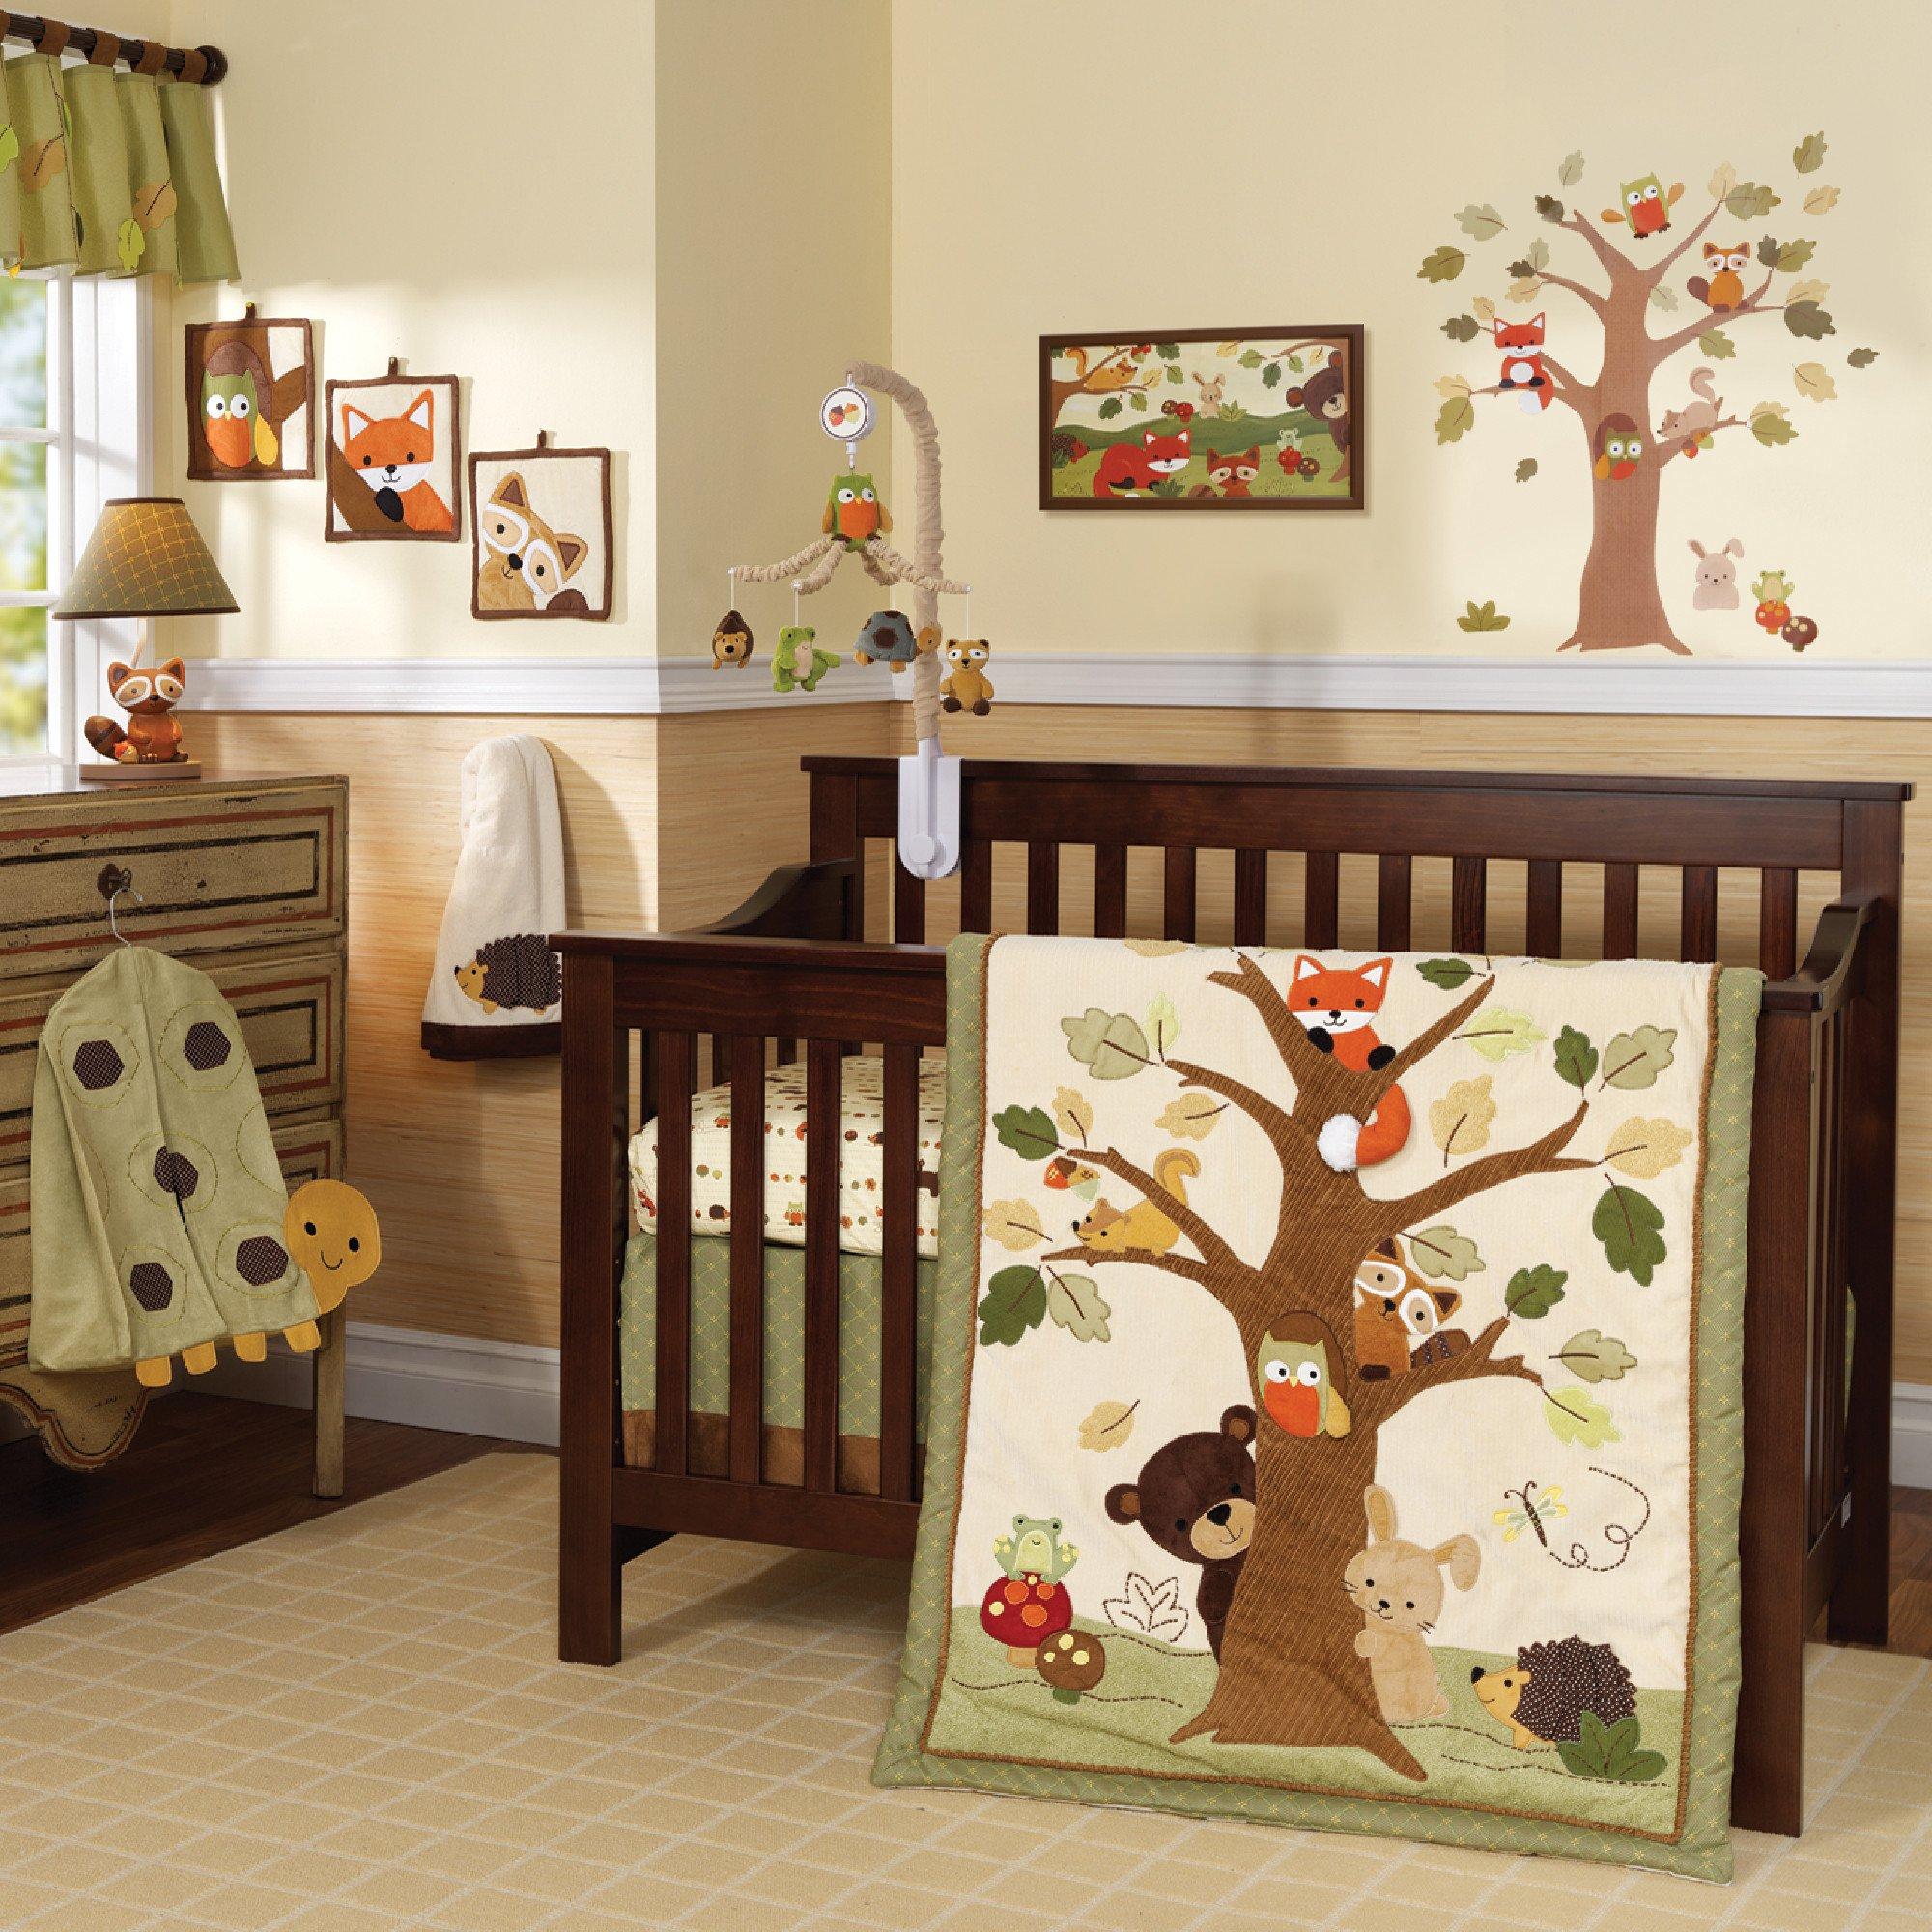 Echo 7 Piece Crib Bedding Set By Lambs Ivy Woodland Baby Tree Animal Neutral